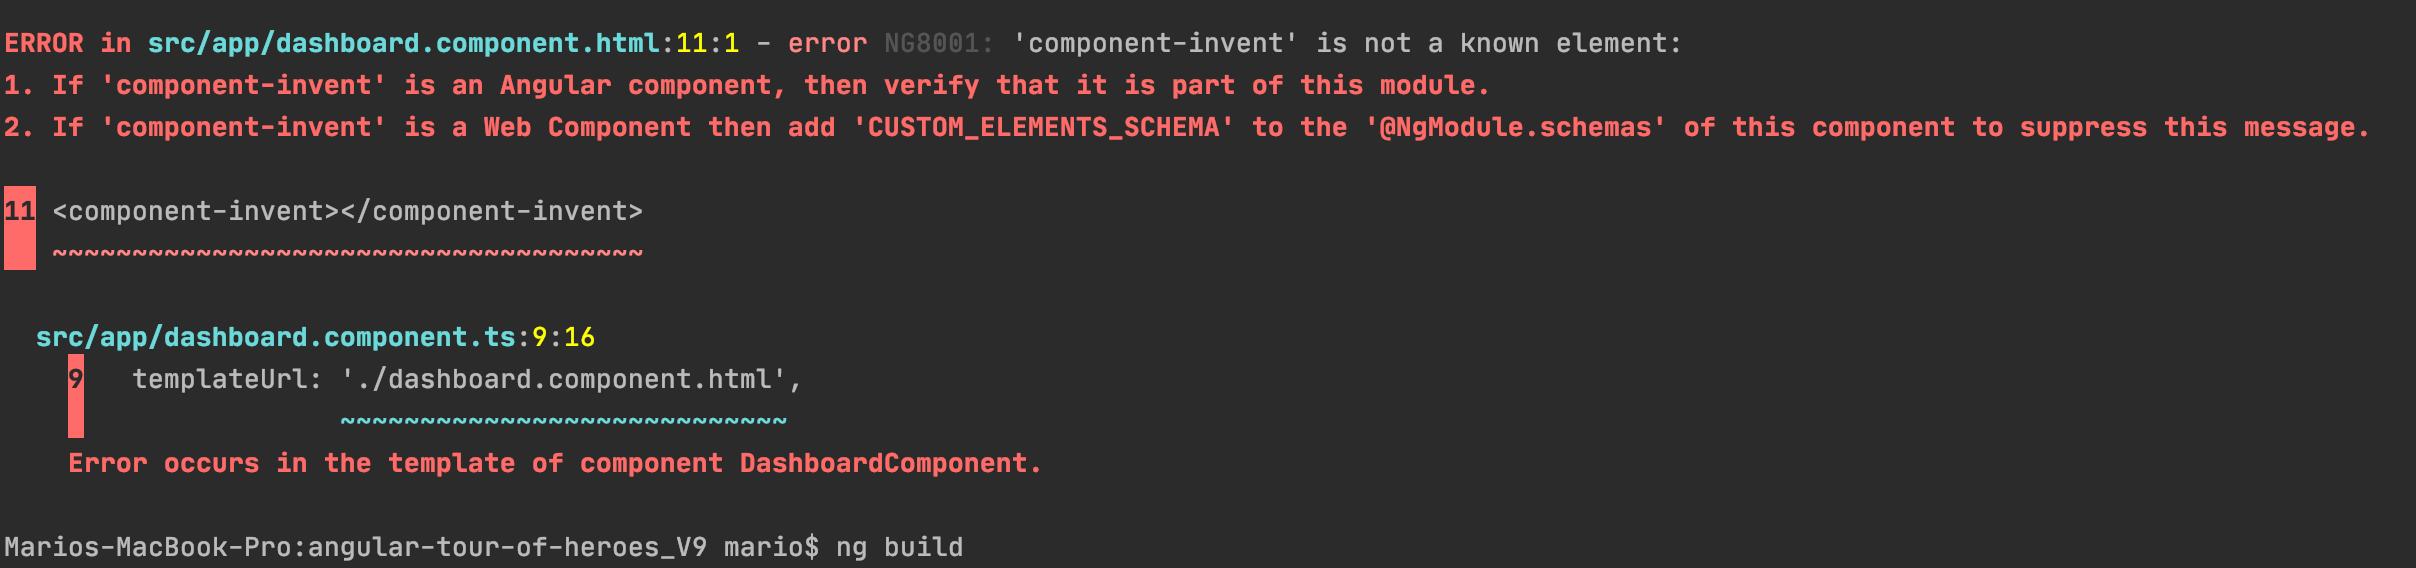 Compile_component_error